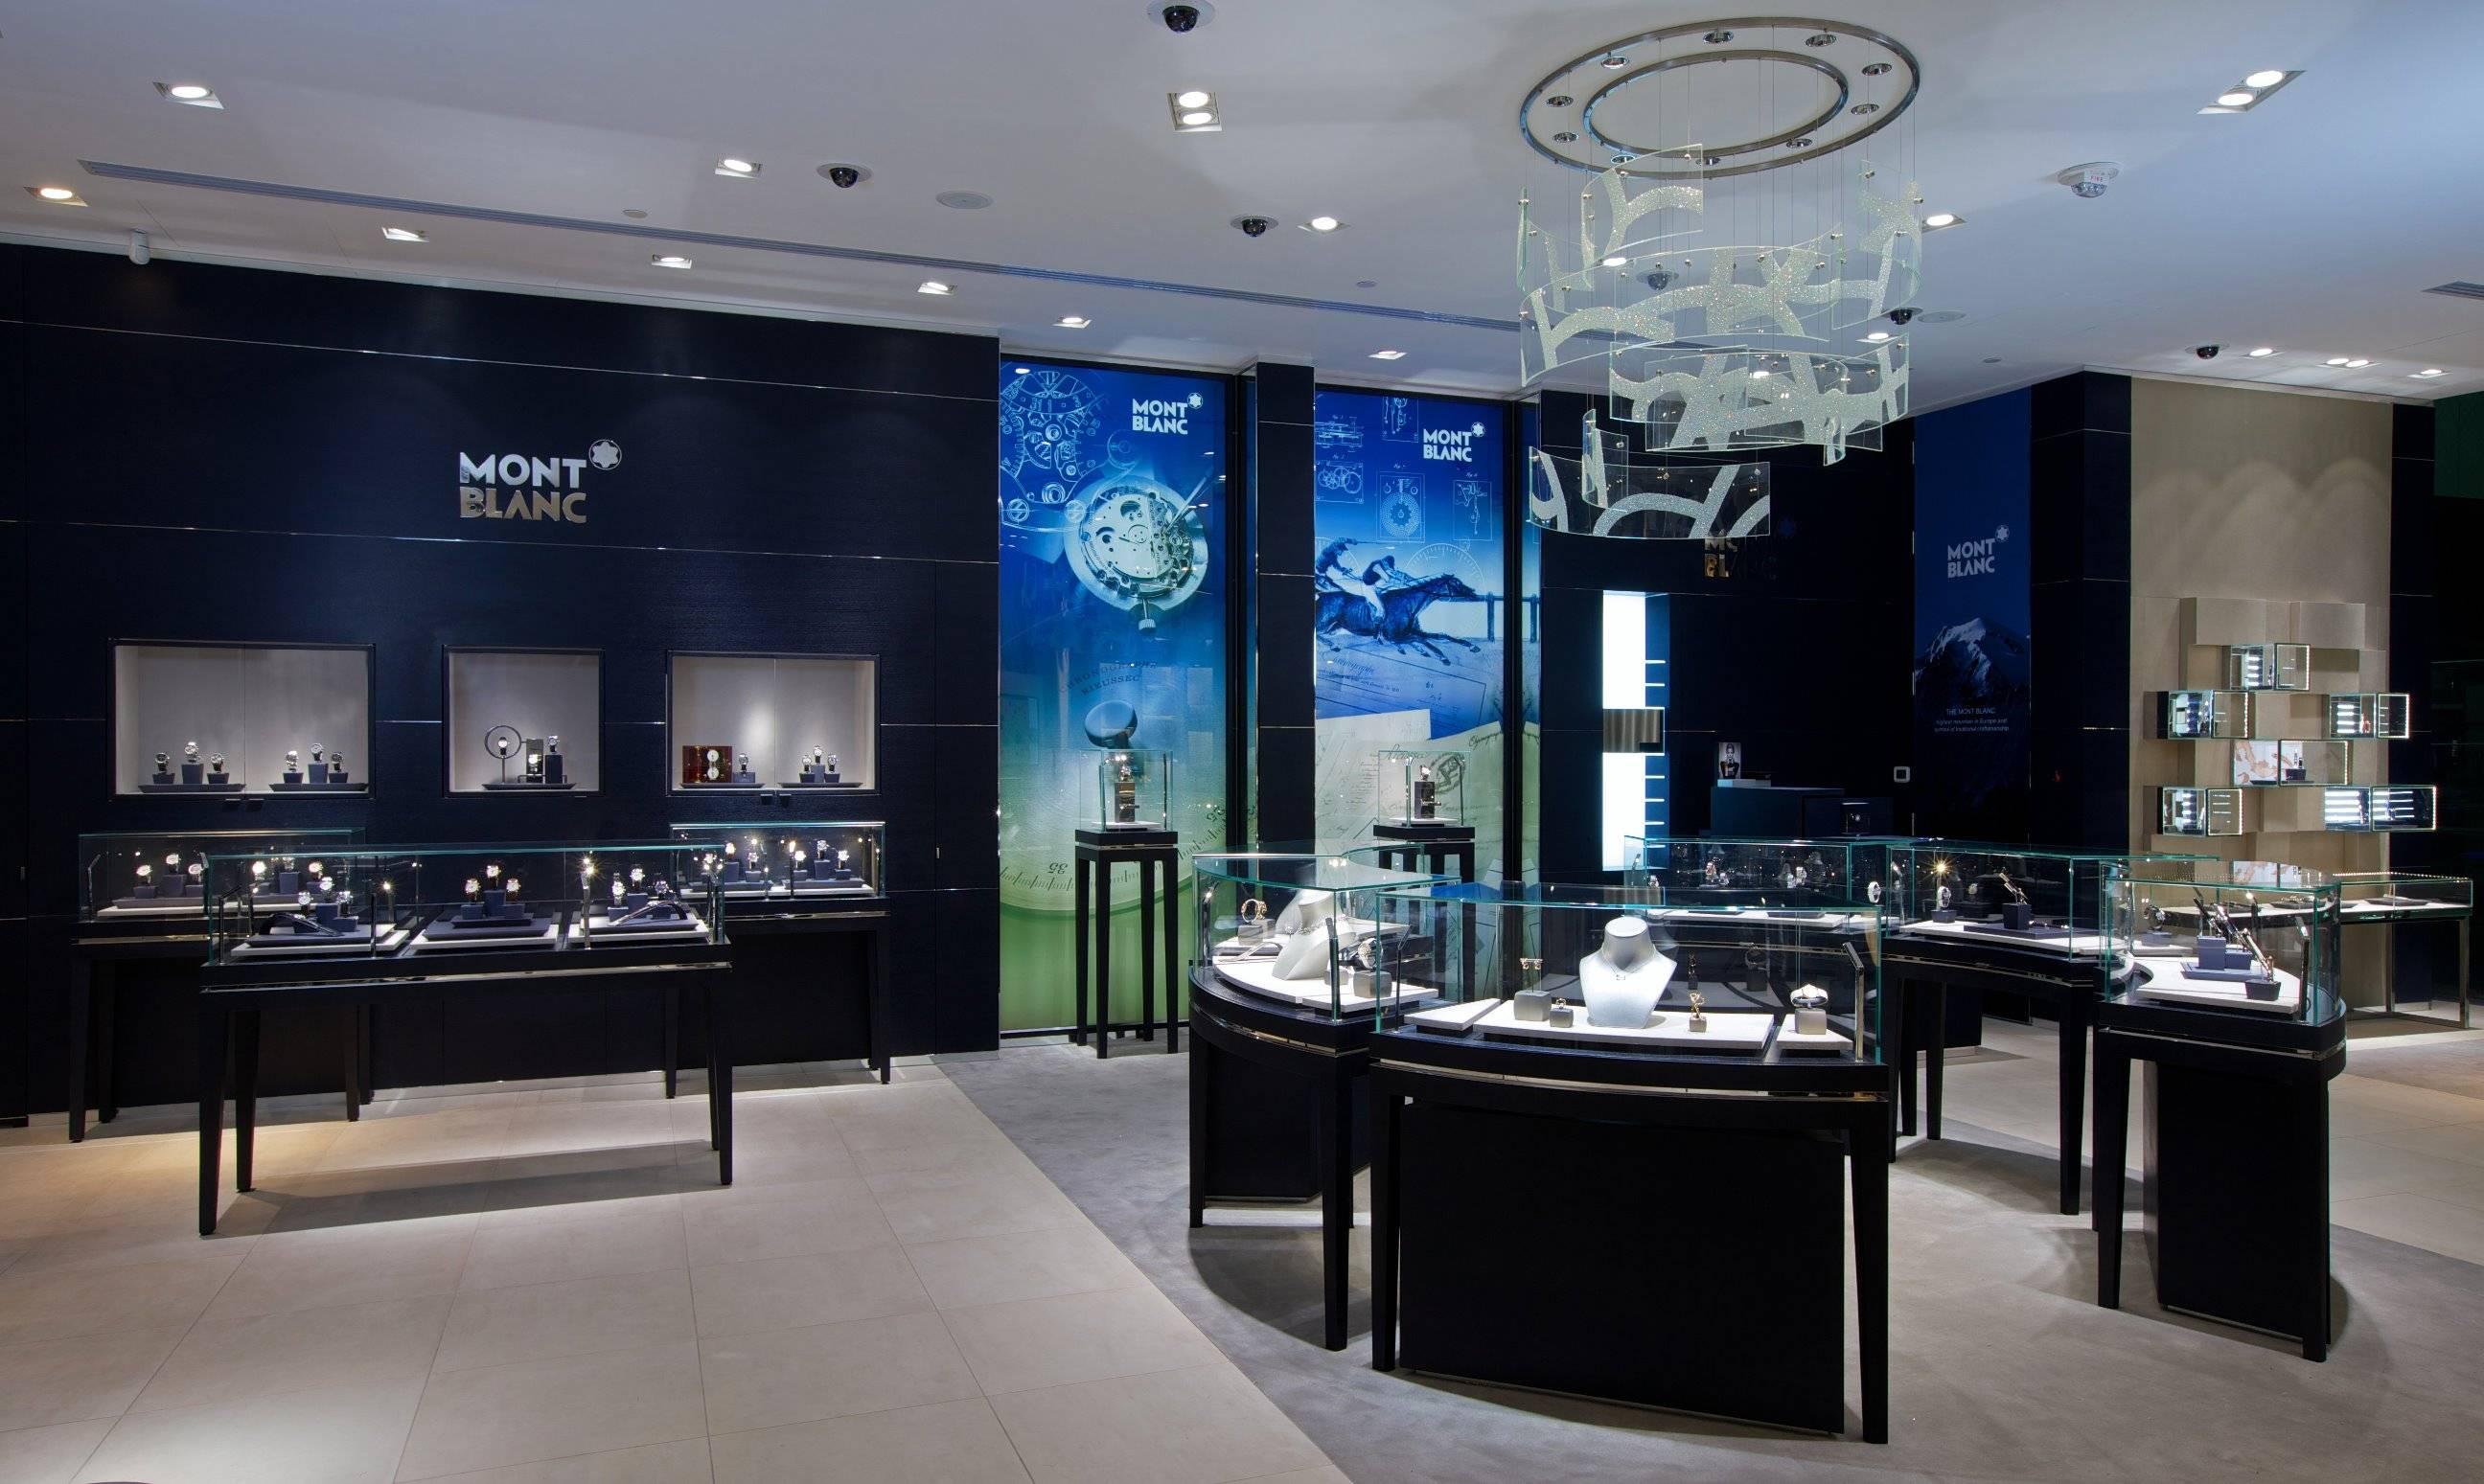 montblanc opens at the galleria on abu dhabi 39 s al maryah island haute living. Black Bedroom Furniture Sets. Home Design Ideas